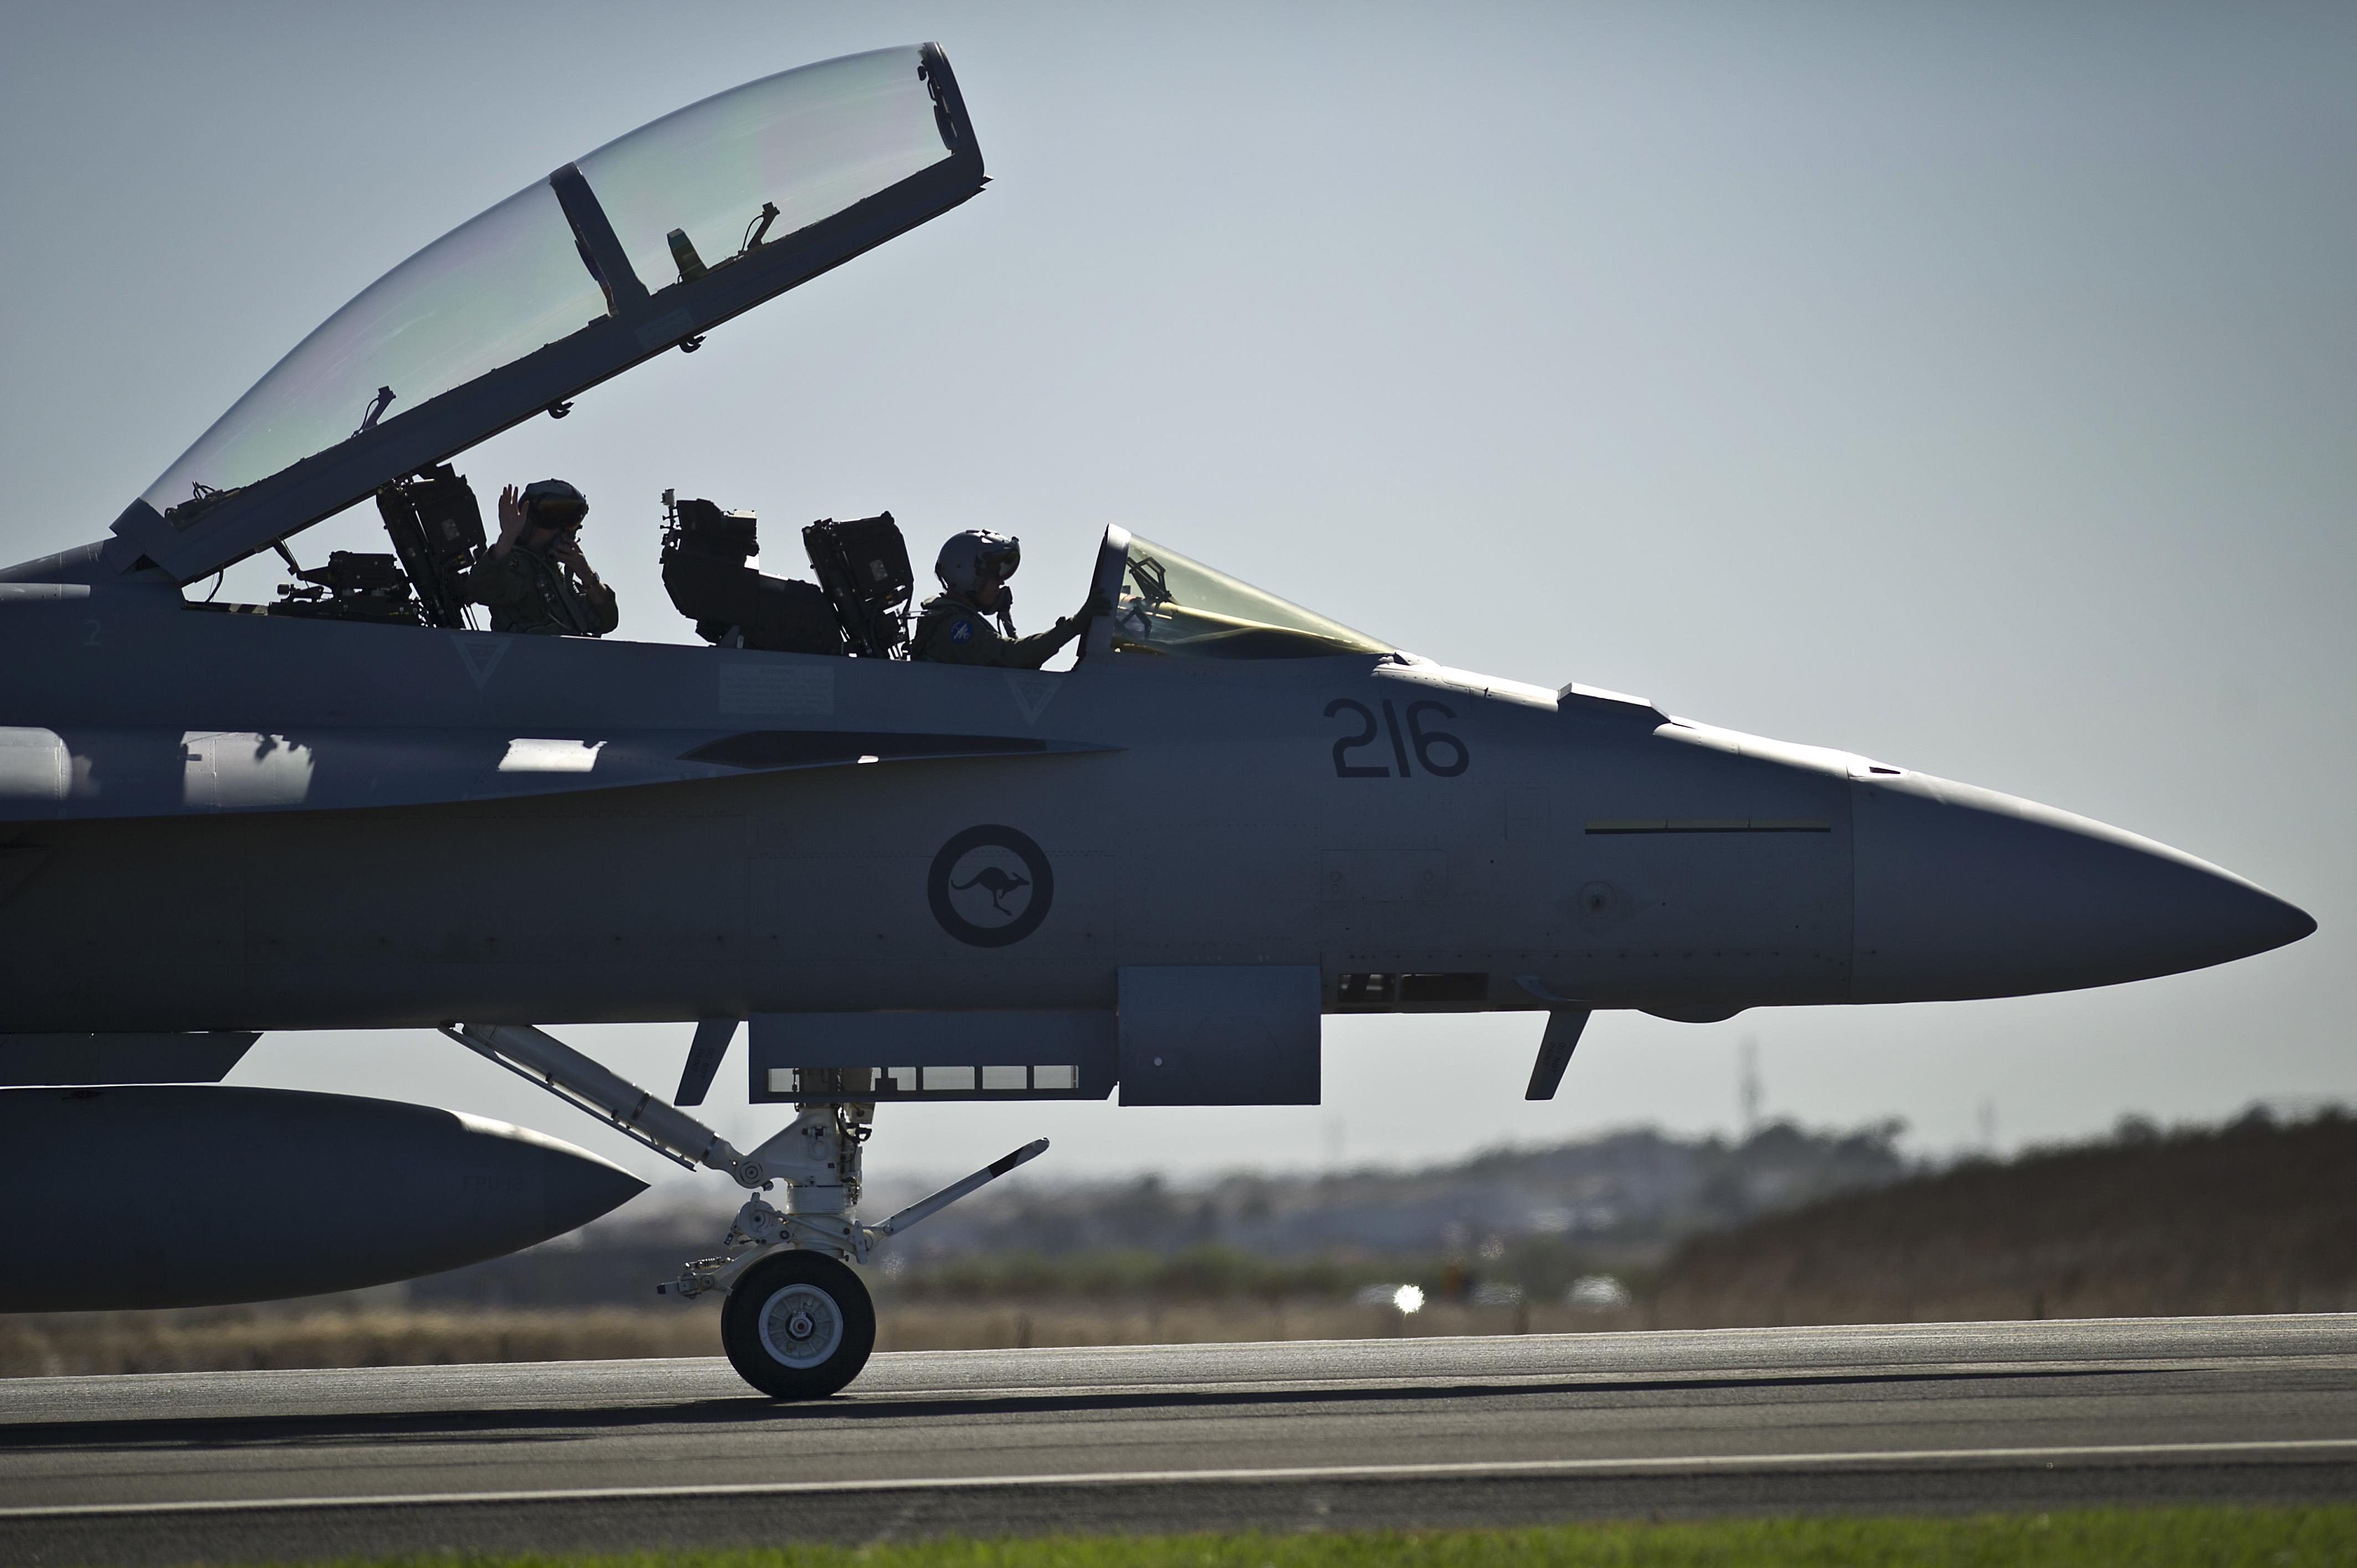 Model Aircraft Canopy Paint Masks Canada